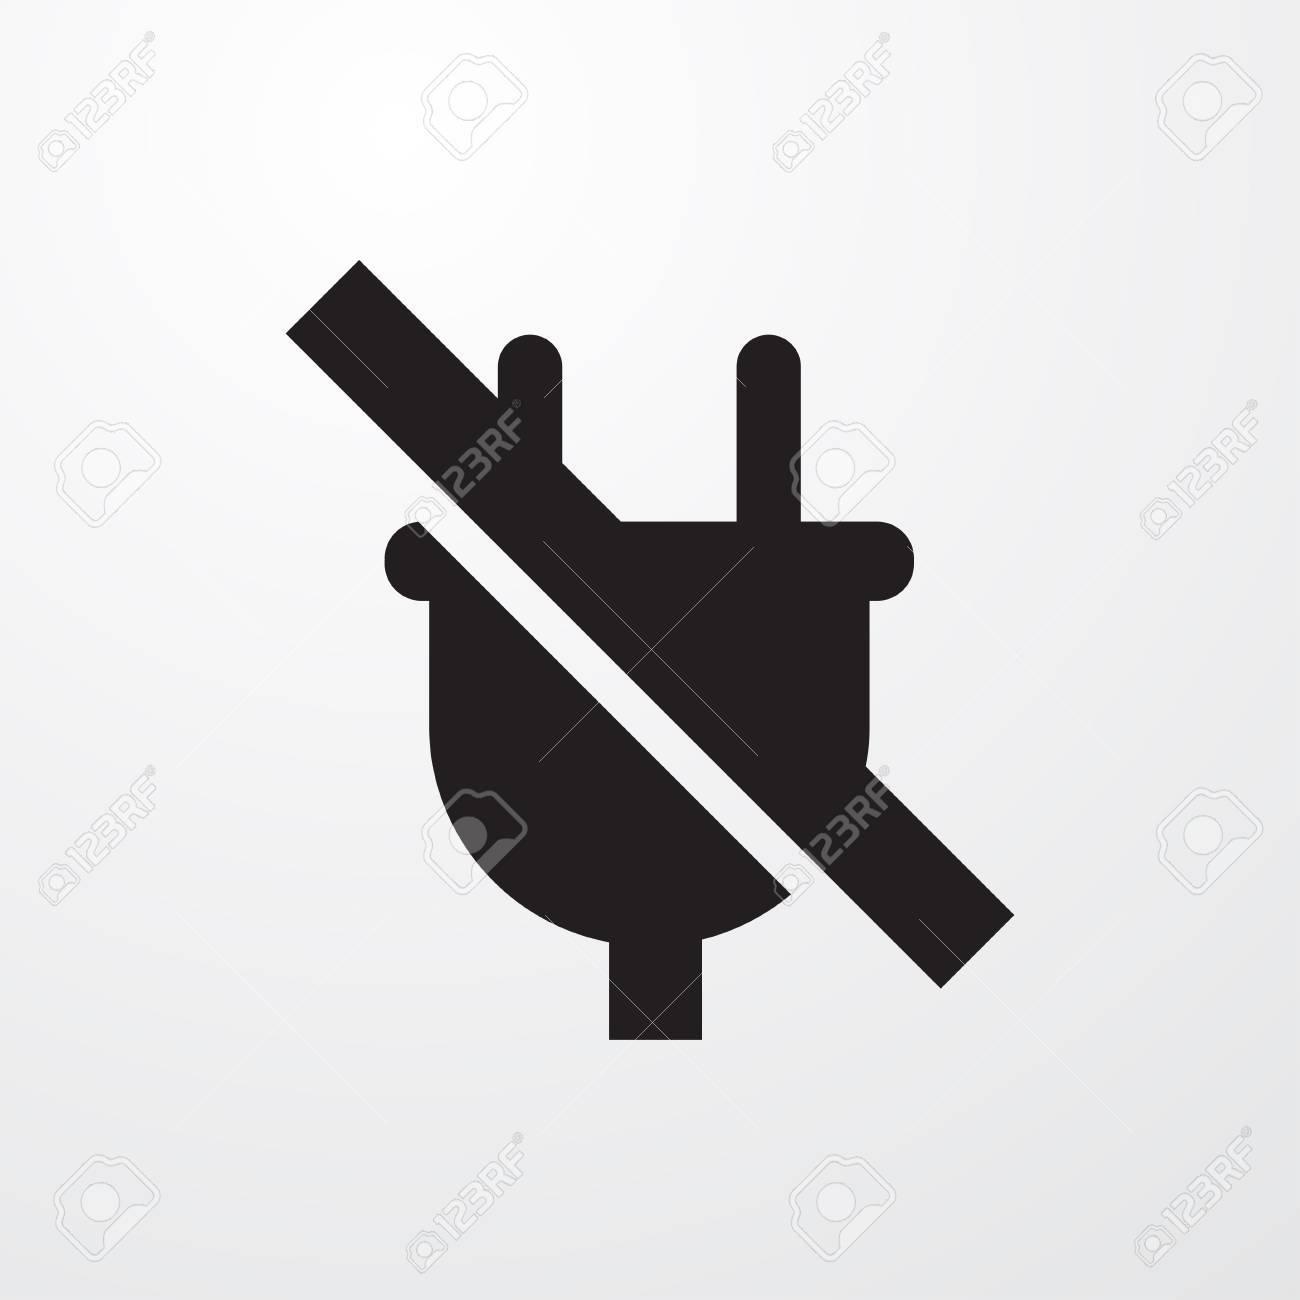 No plug symbol clipart library no plug icon illustration isolated vector sign symbol royalty free restart symbol green plug buycottarizona